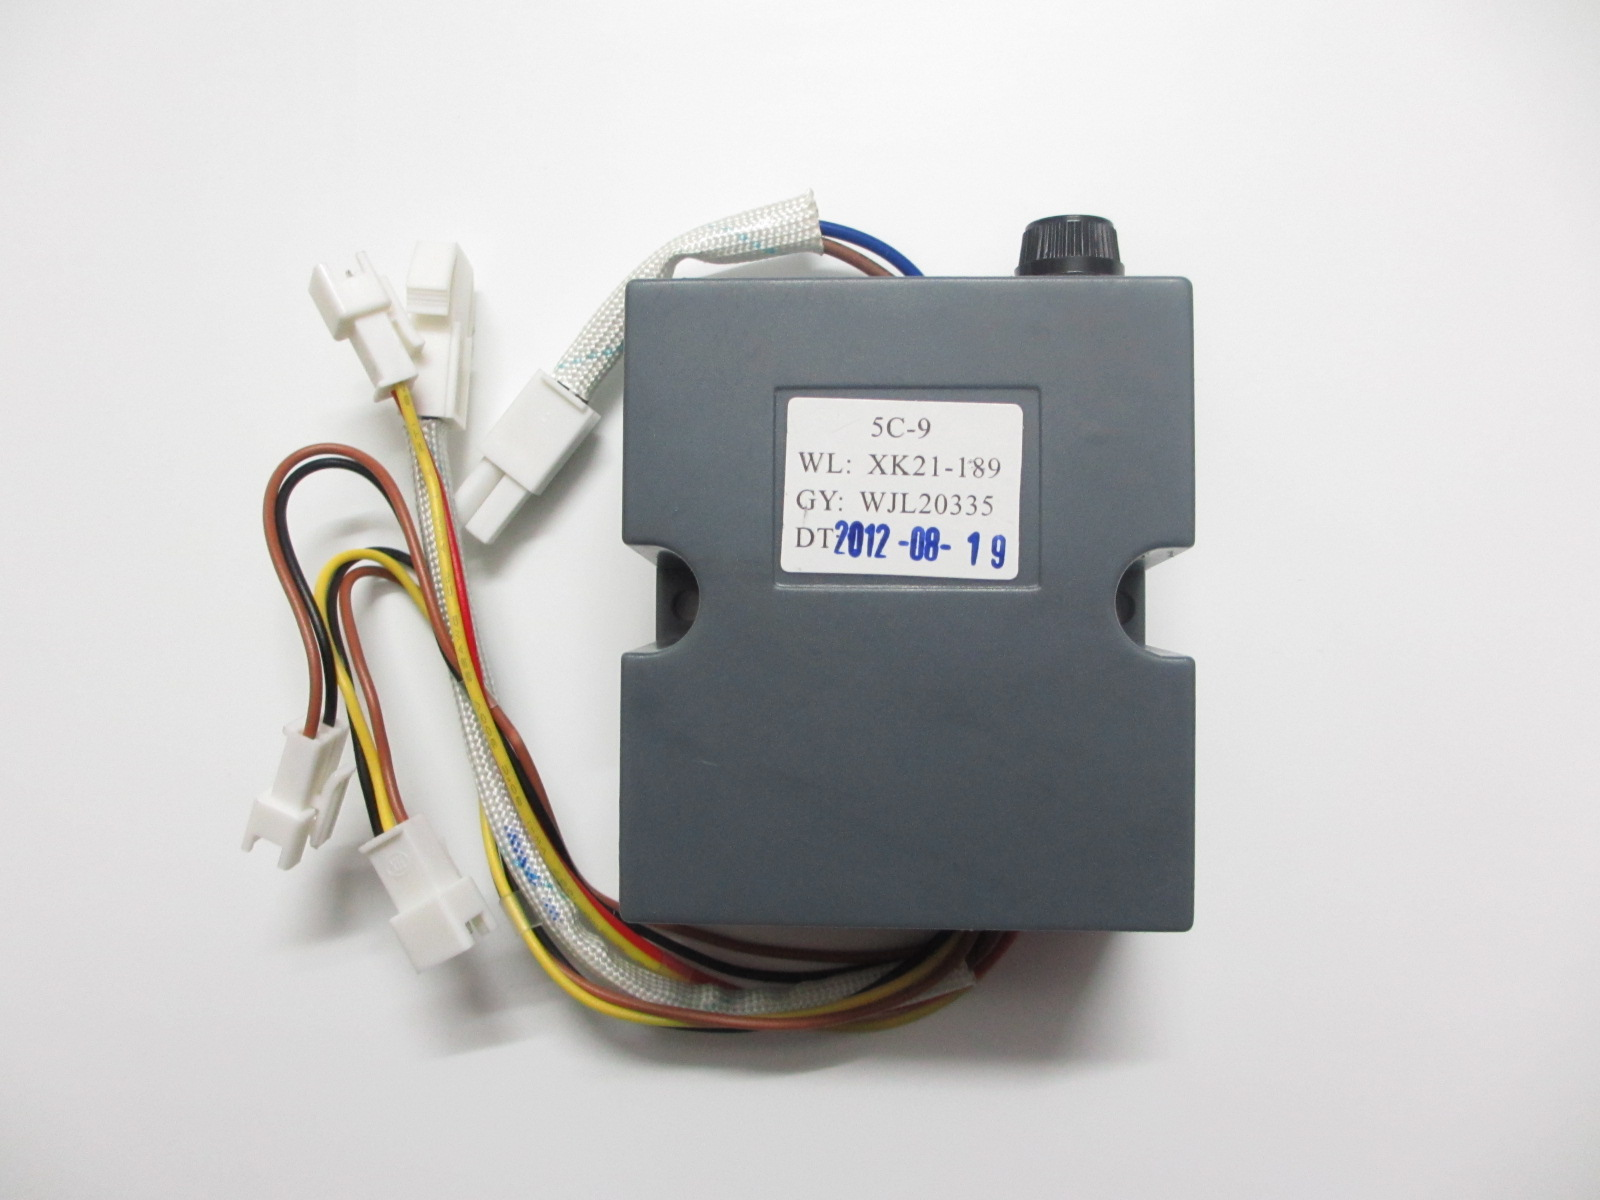 Smart Water Heater Gas Water Heater 5c-9 5c-7